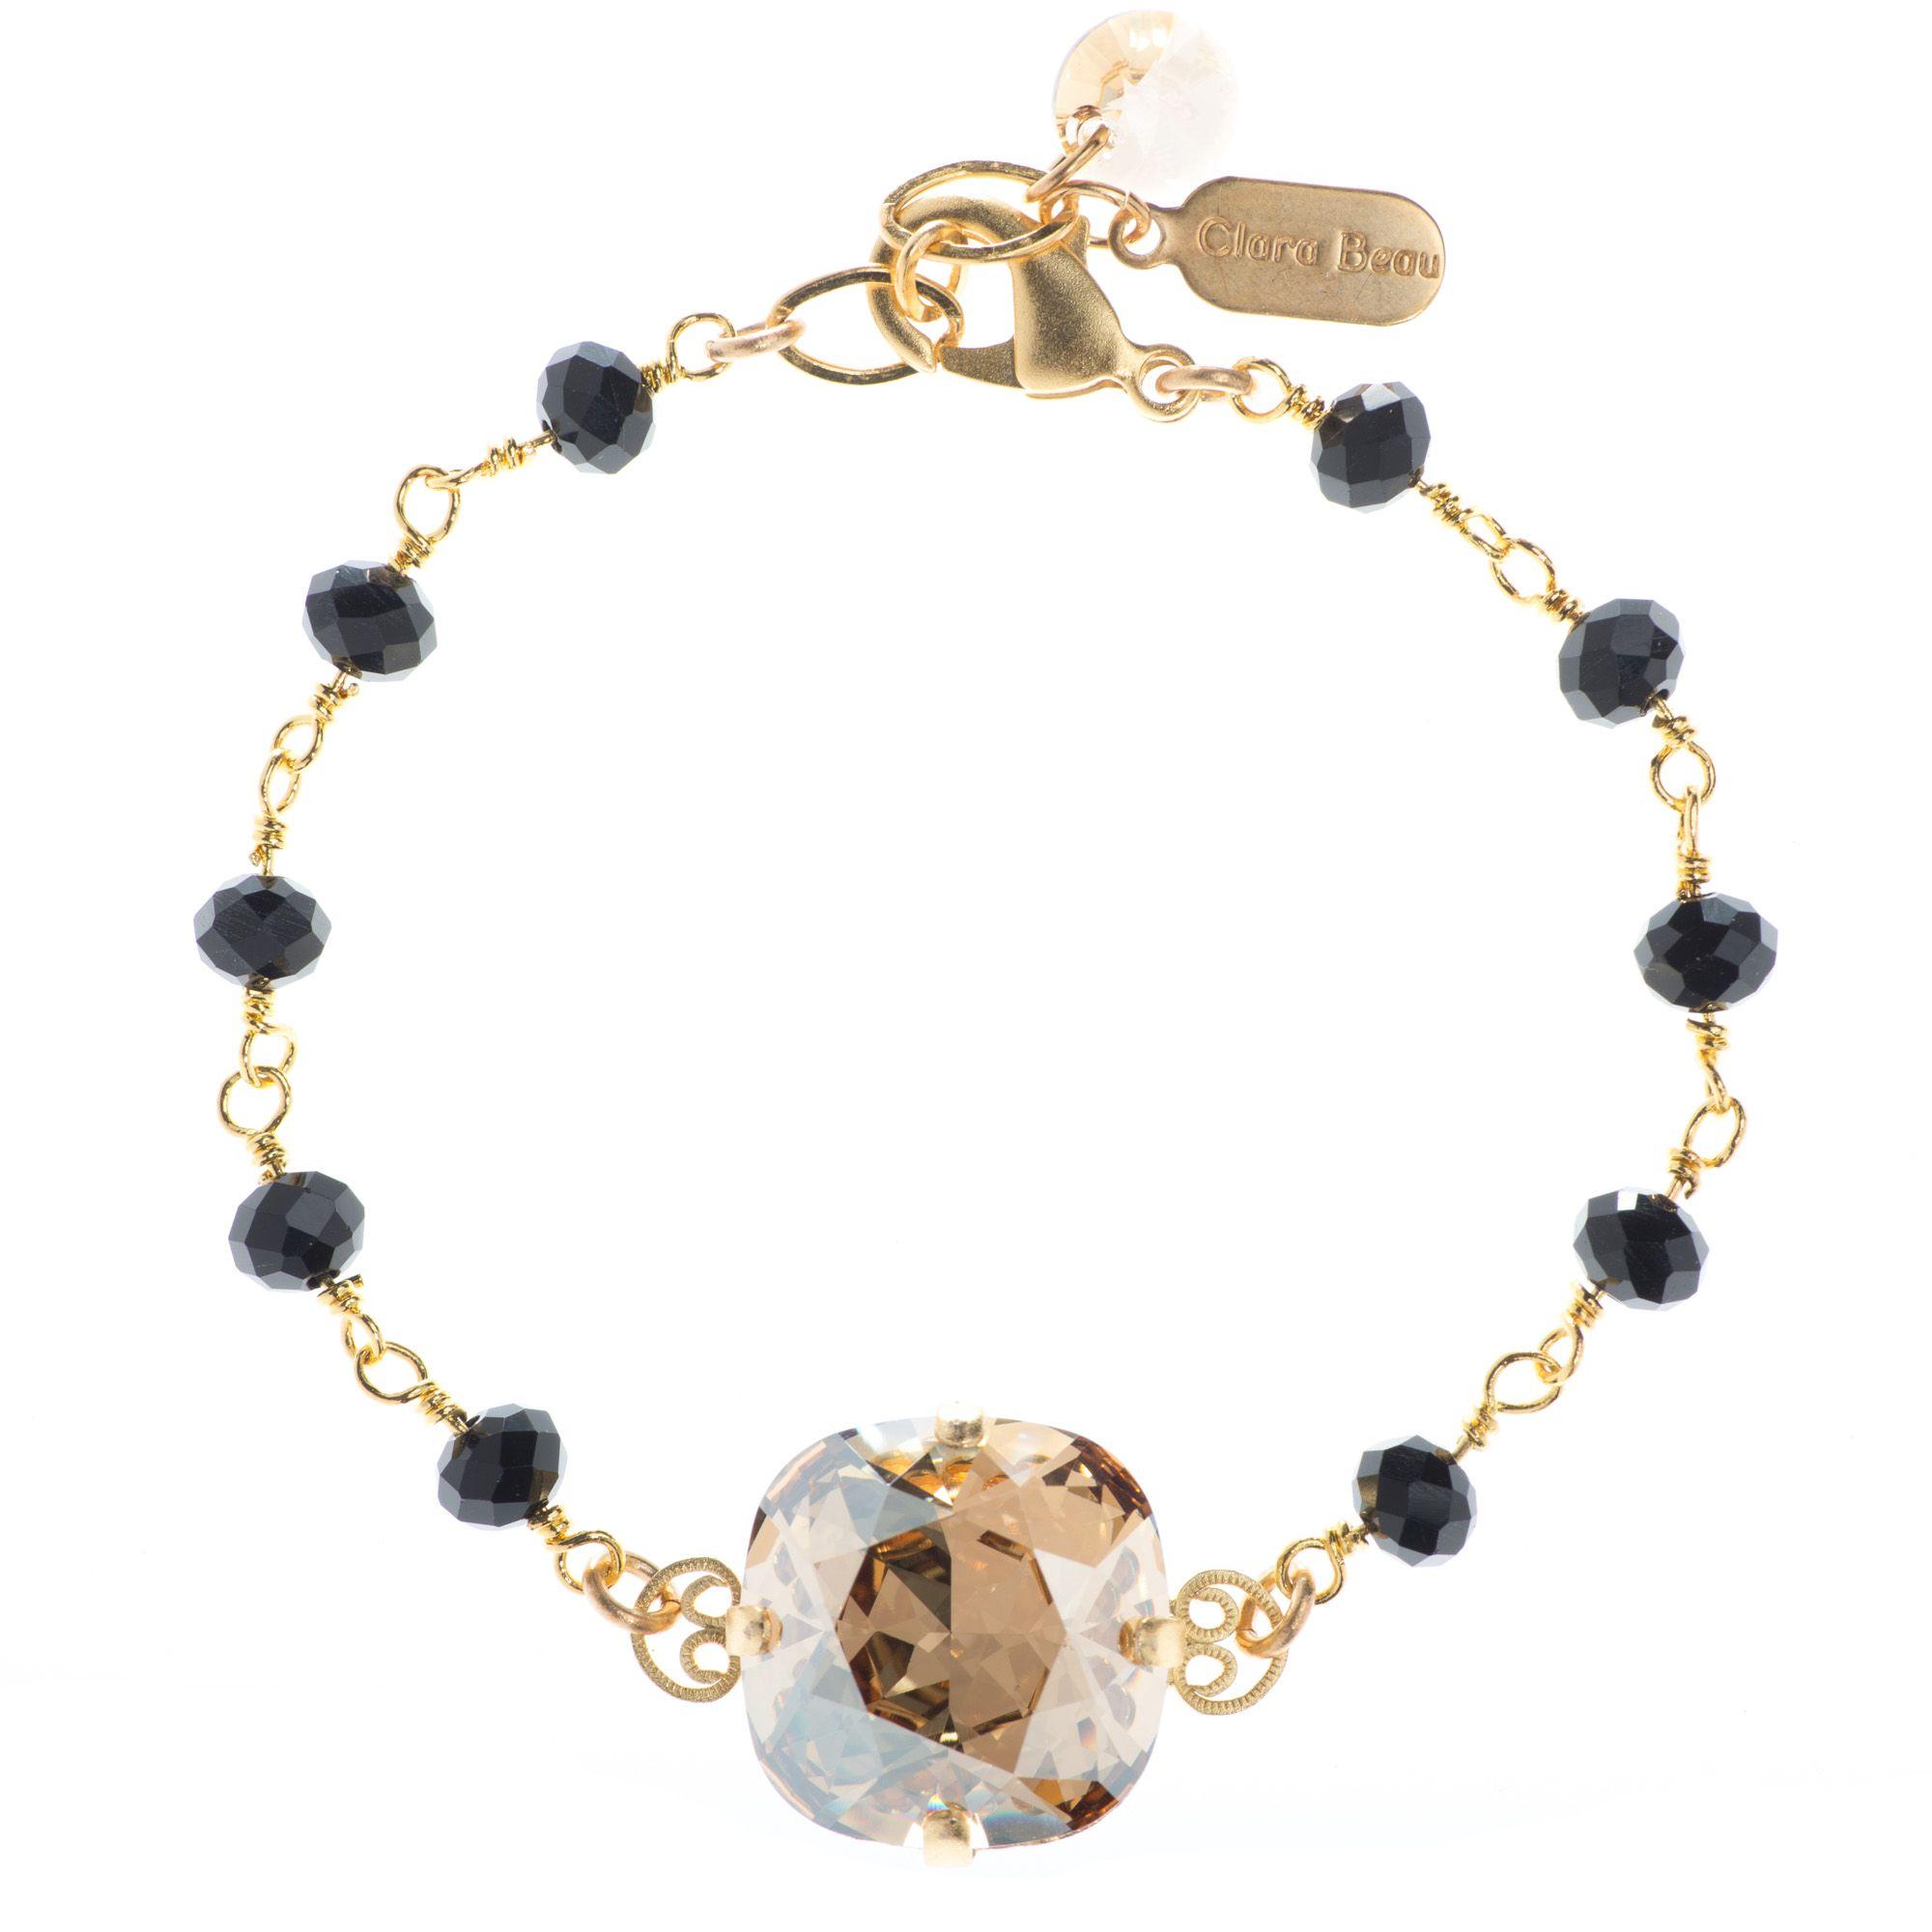 Clara Beau Elegant 18mm Golden Shadow Swarovski Black Beaded Bracelet